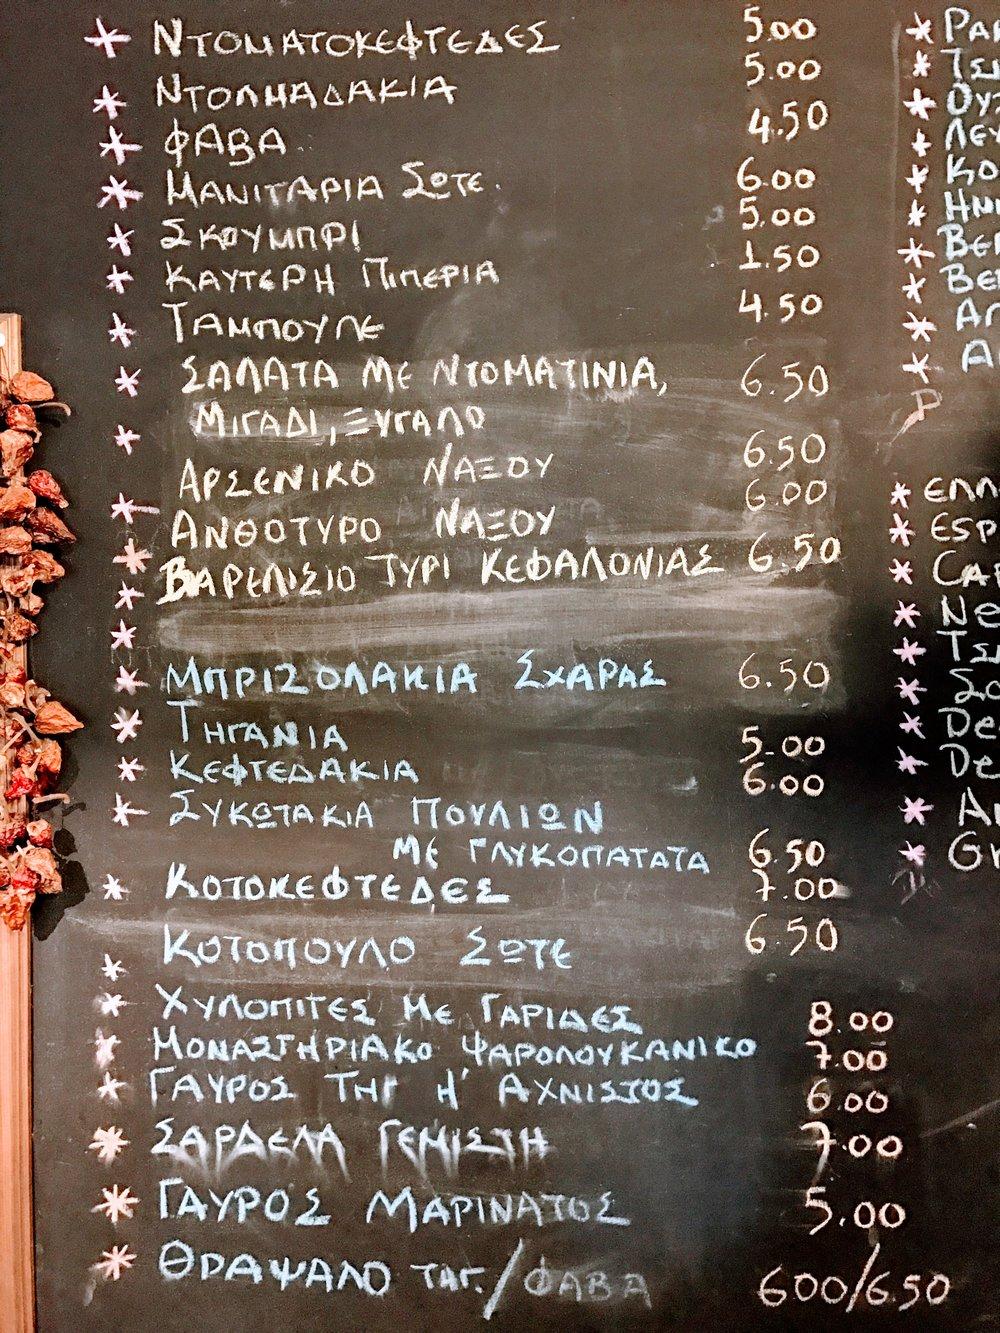 Chalkboard menu adapting to everyday's fresh produce